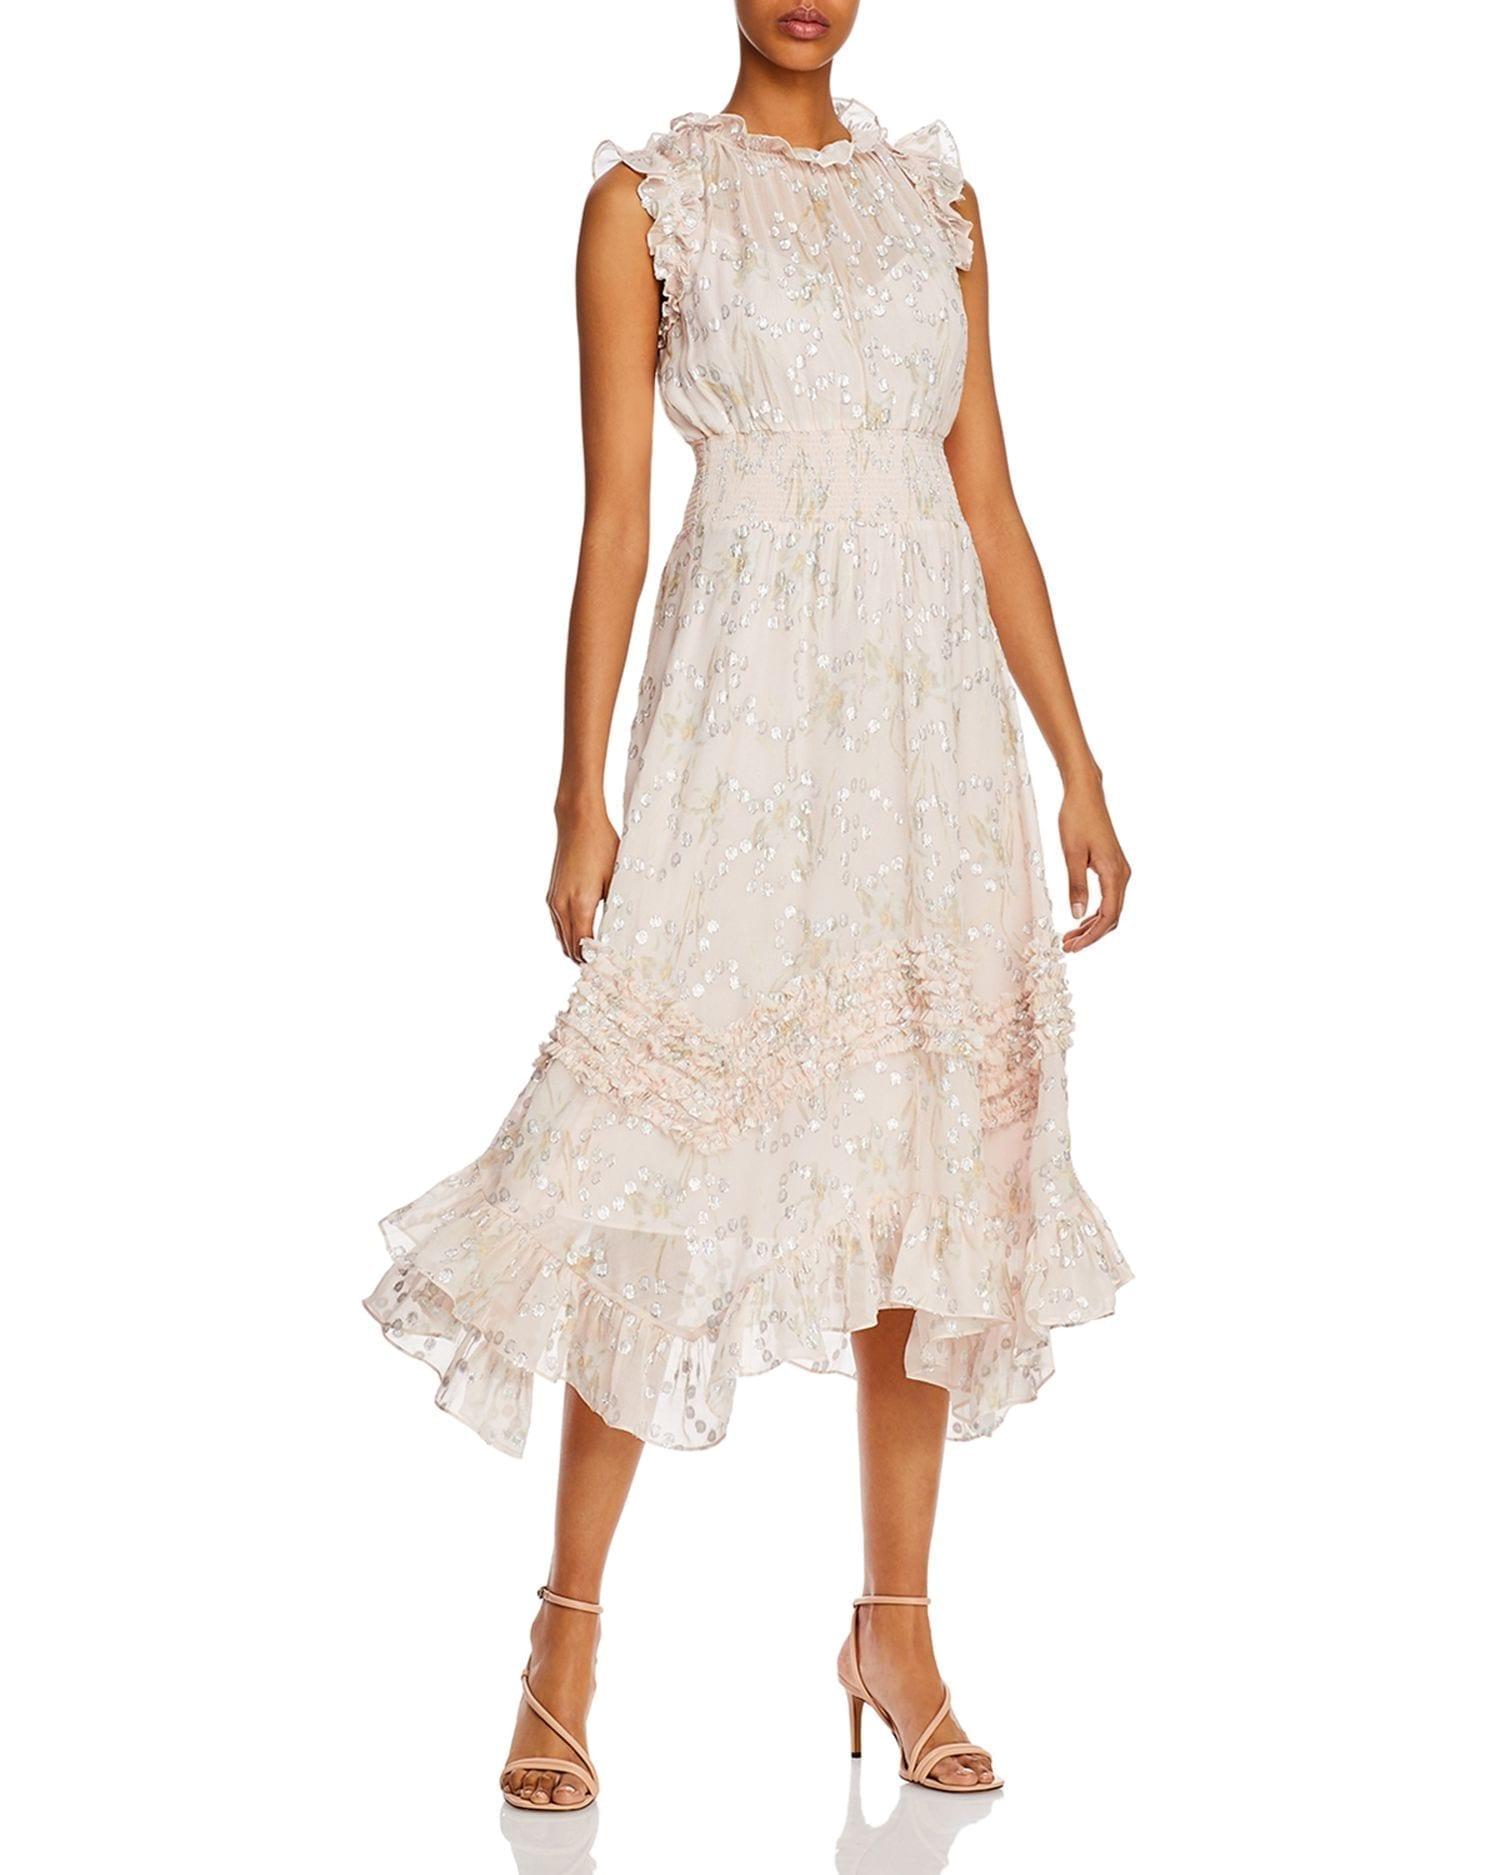 REBECCA TAYLOR Ruffled Smocked Dress